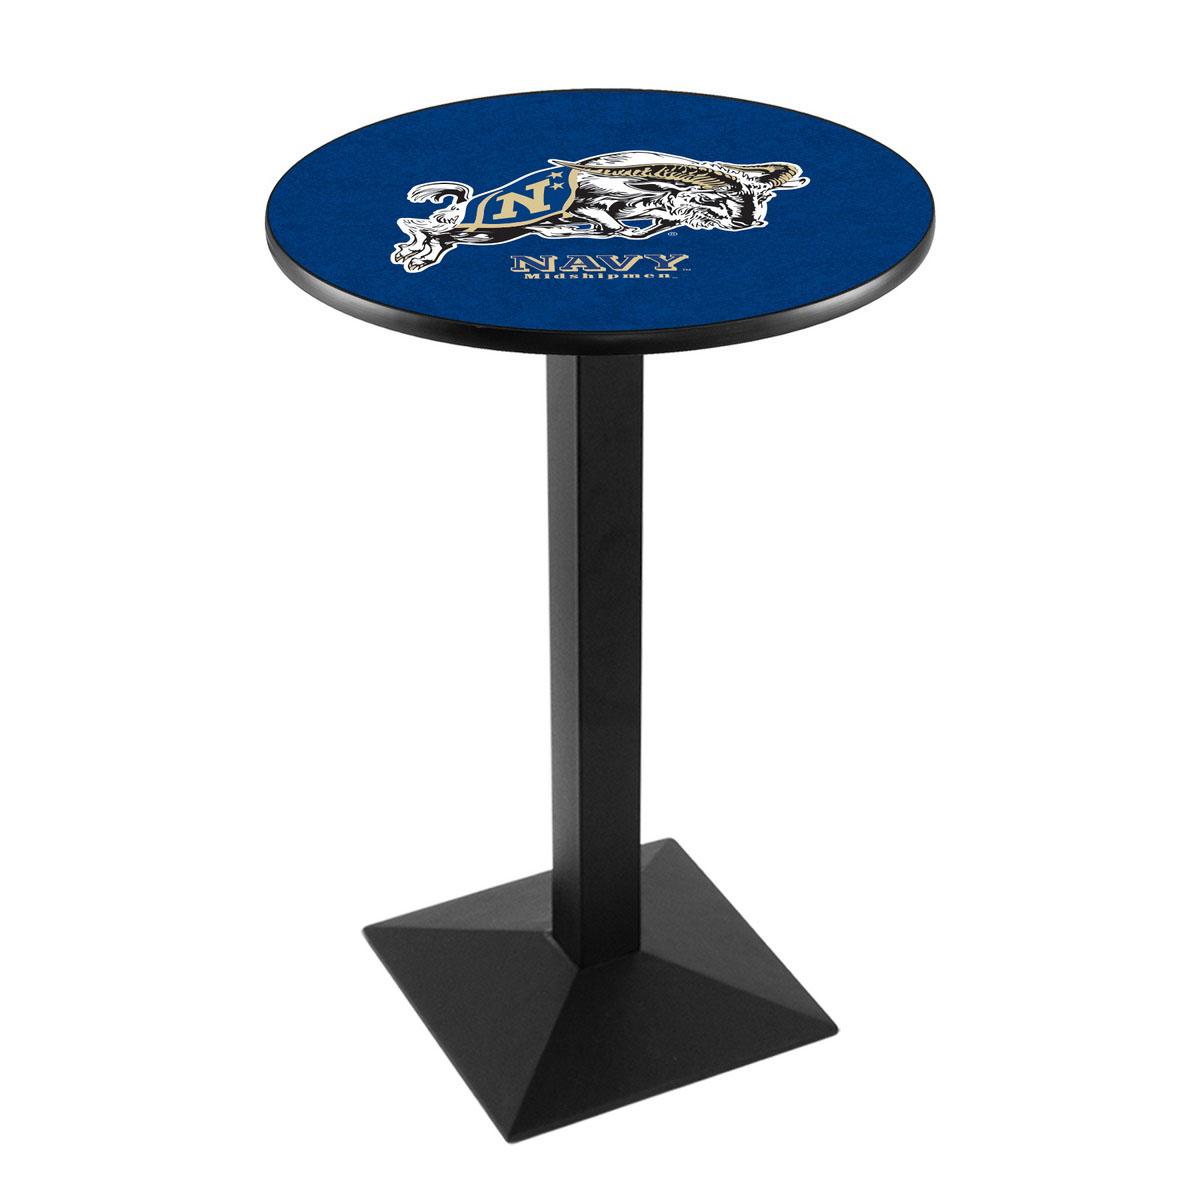 Money saving Us Naval Academy Logo Pub Bar Table Square Stand Product Photo